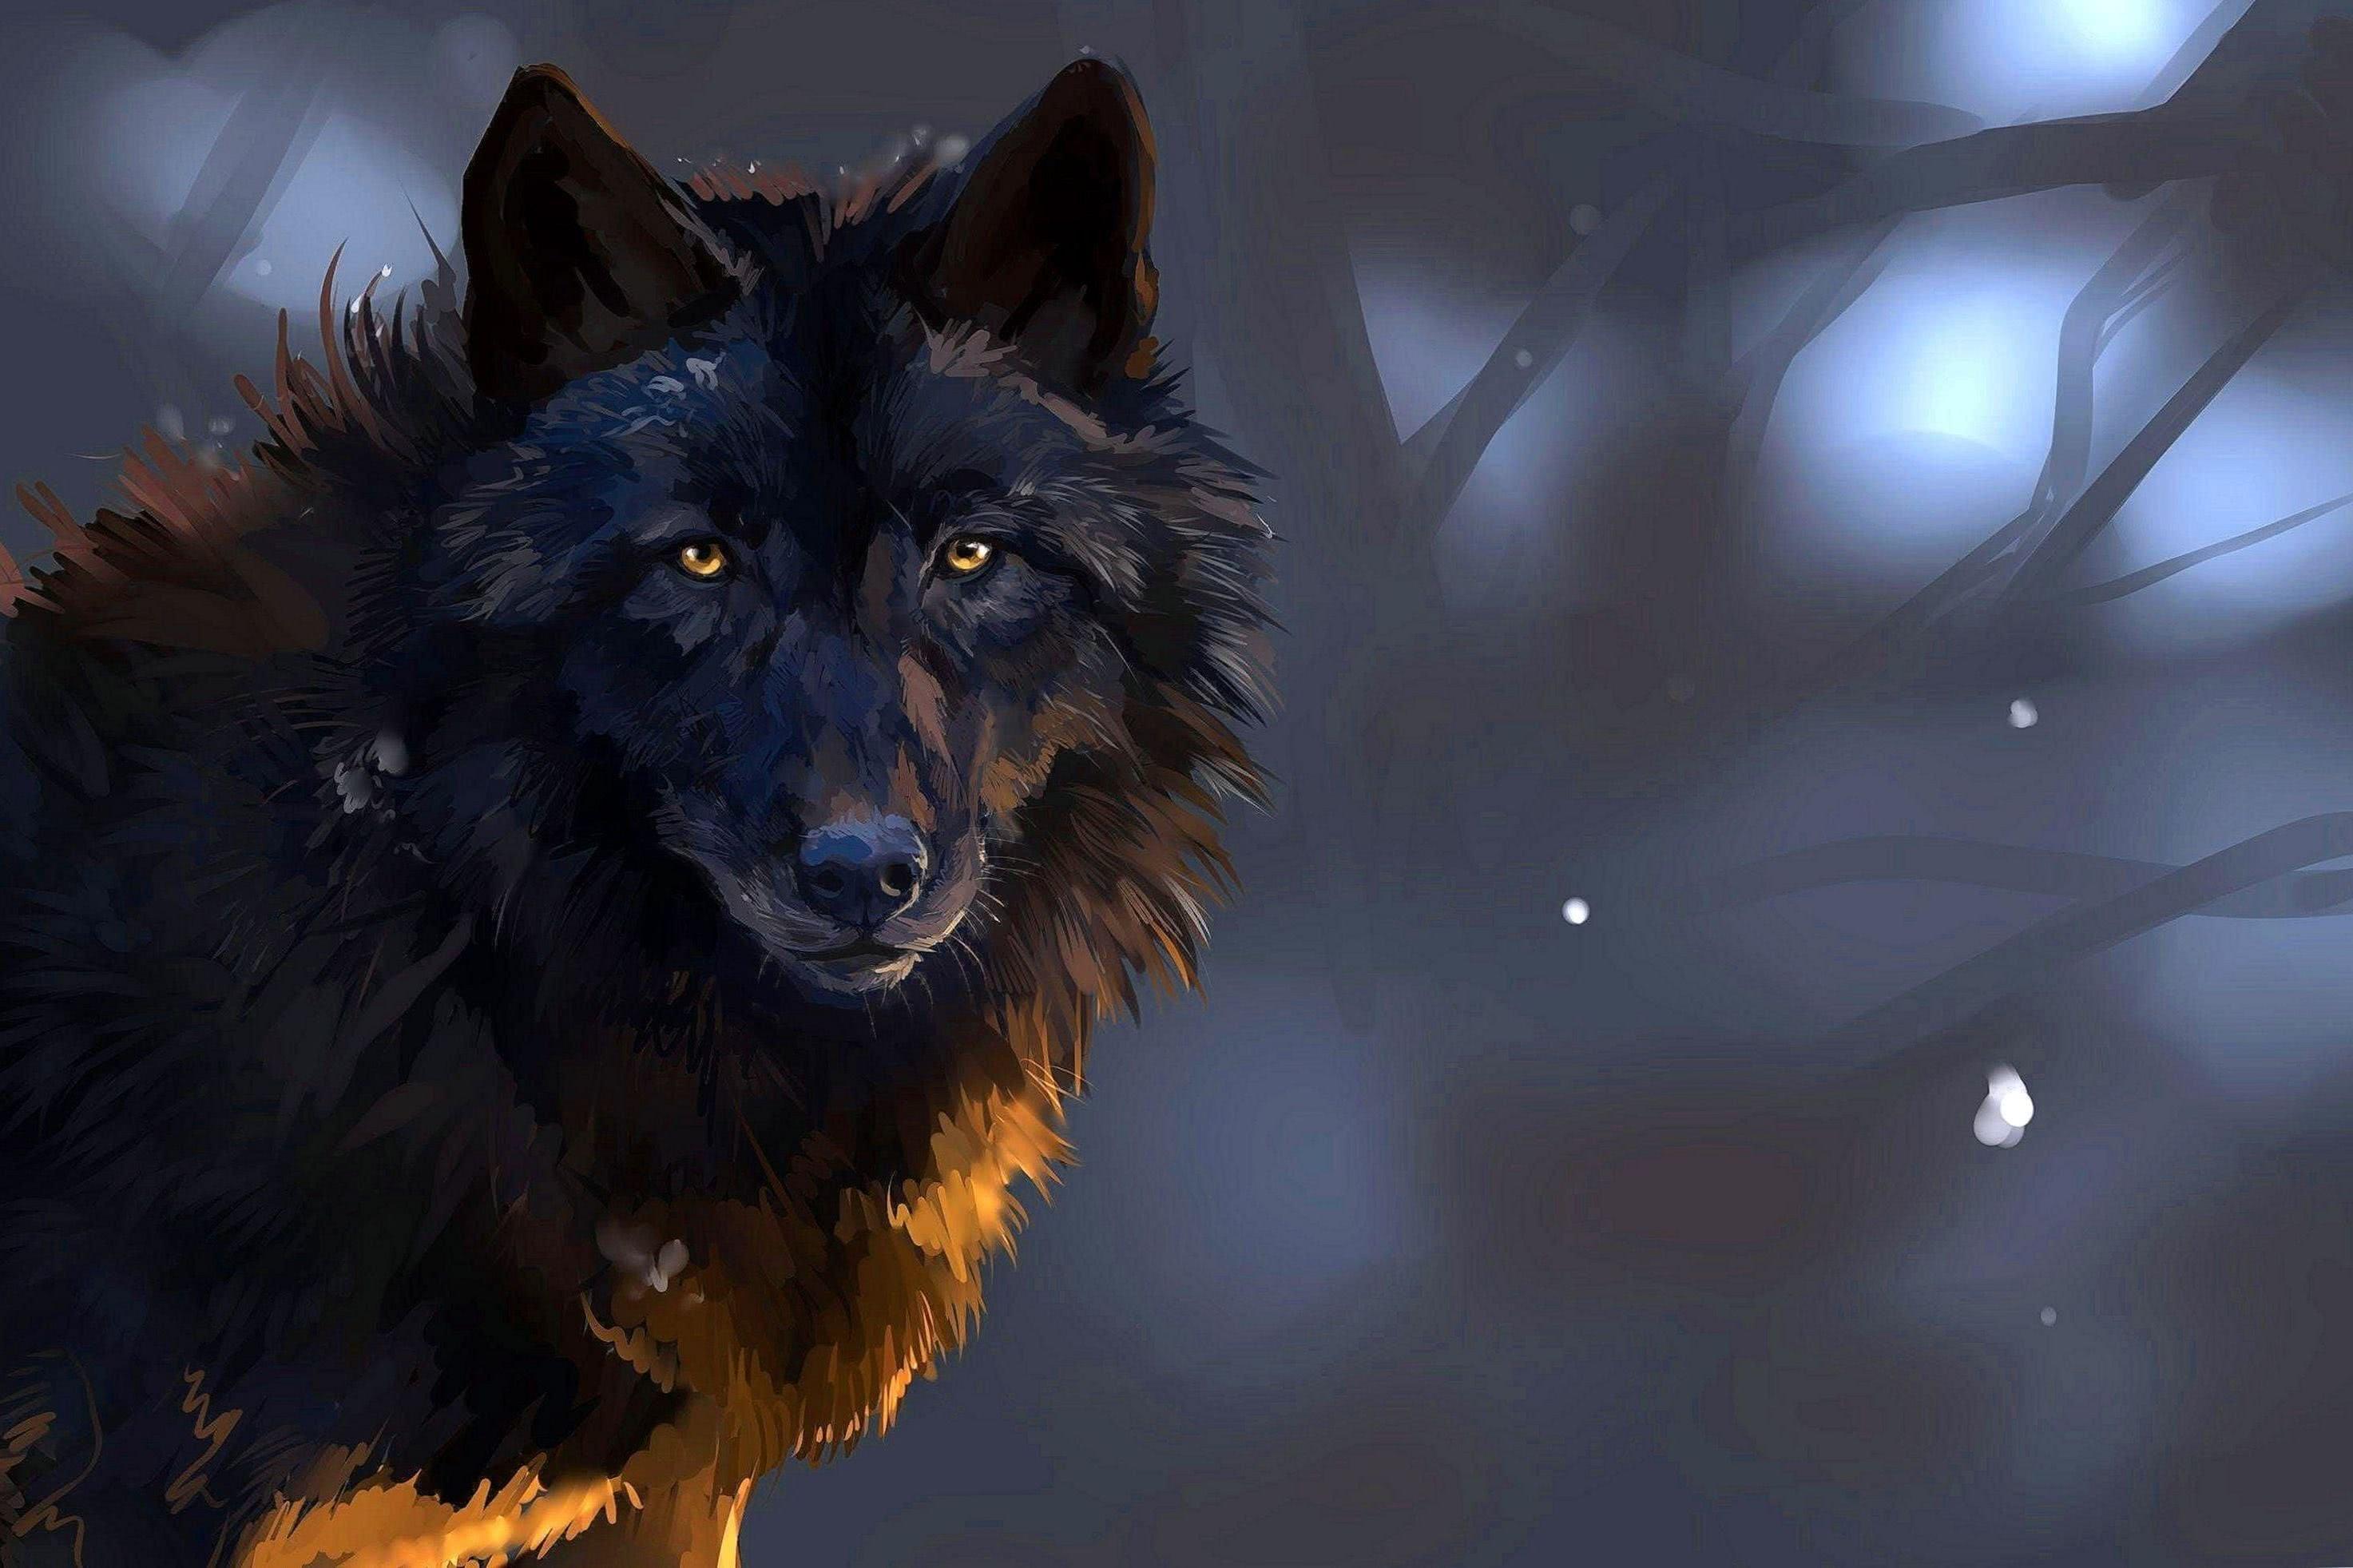 Dark Wolf Wallpapers HD